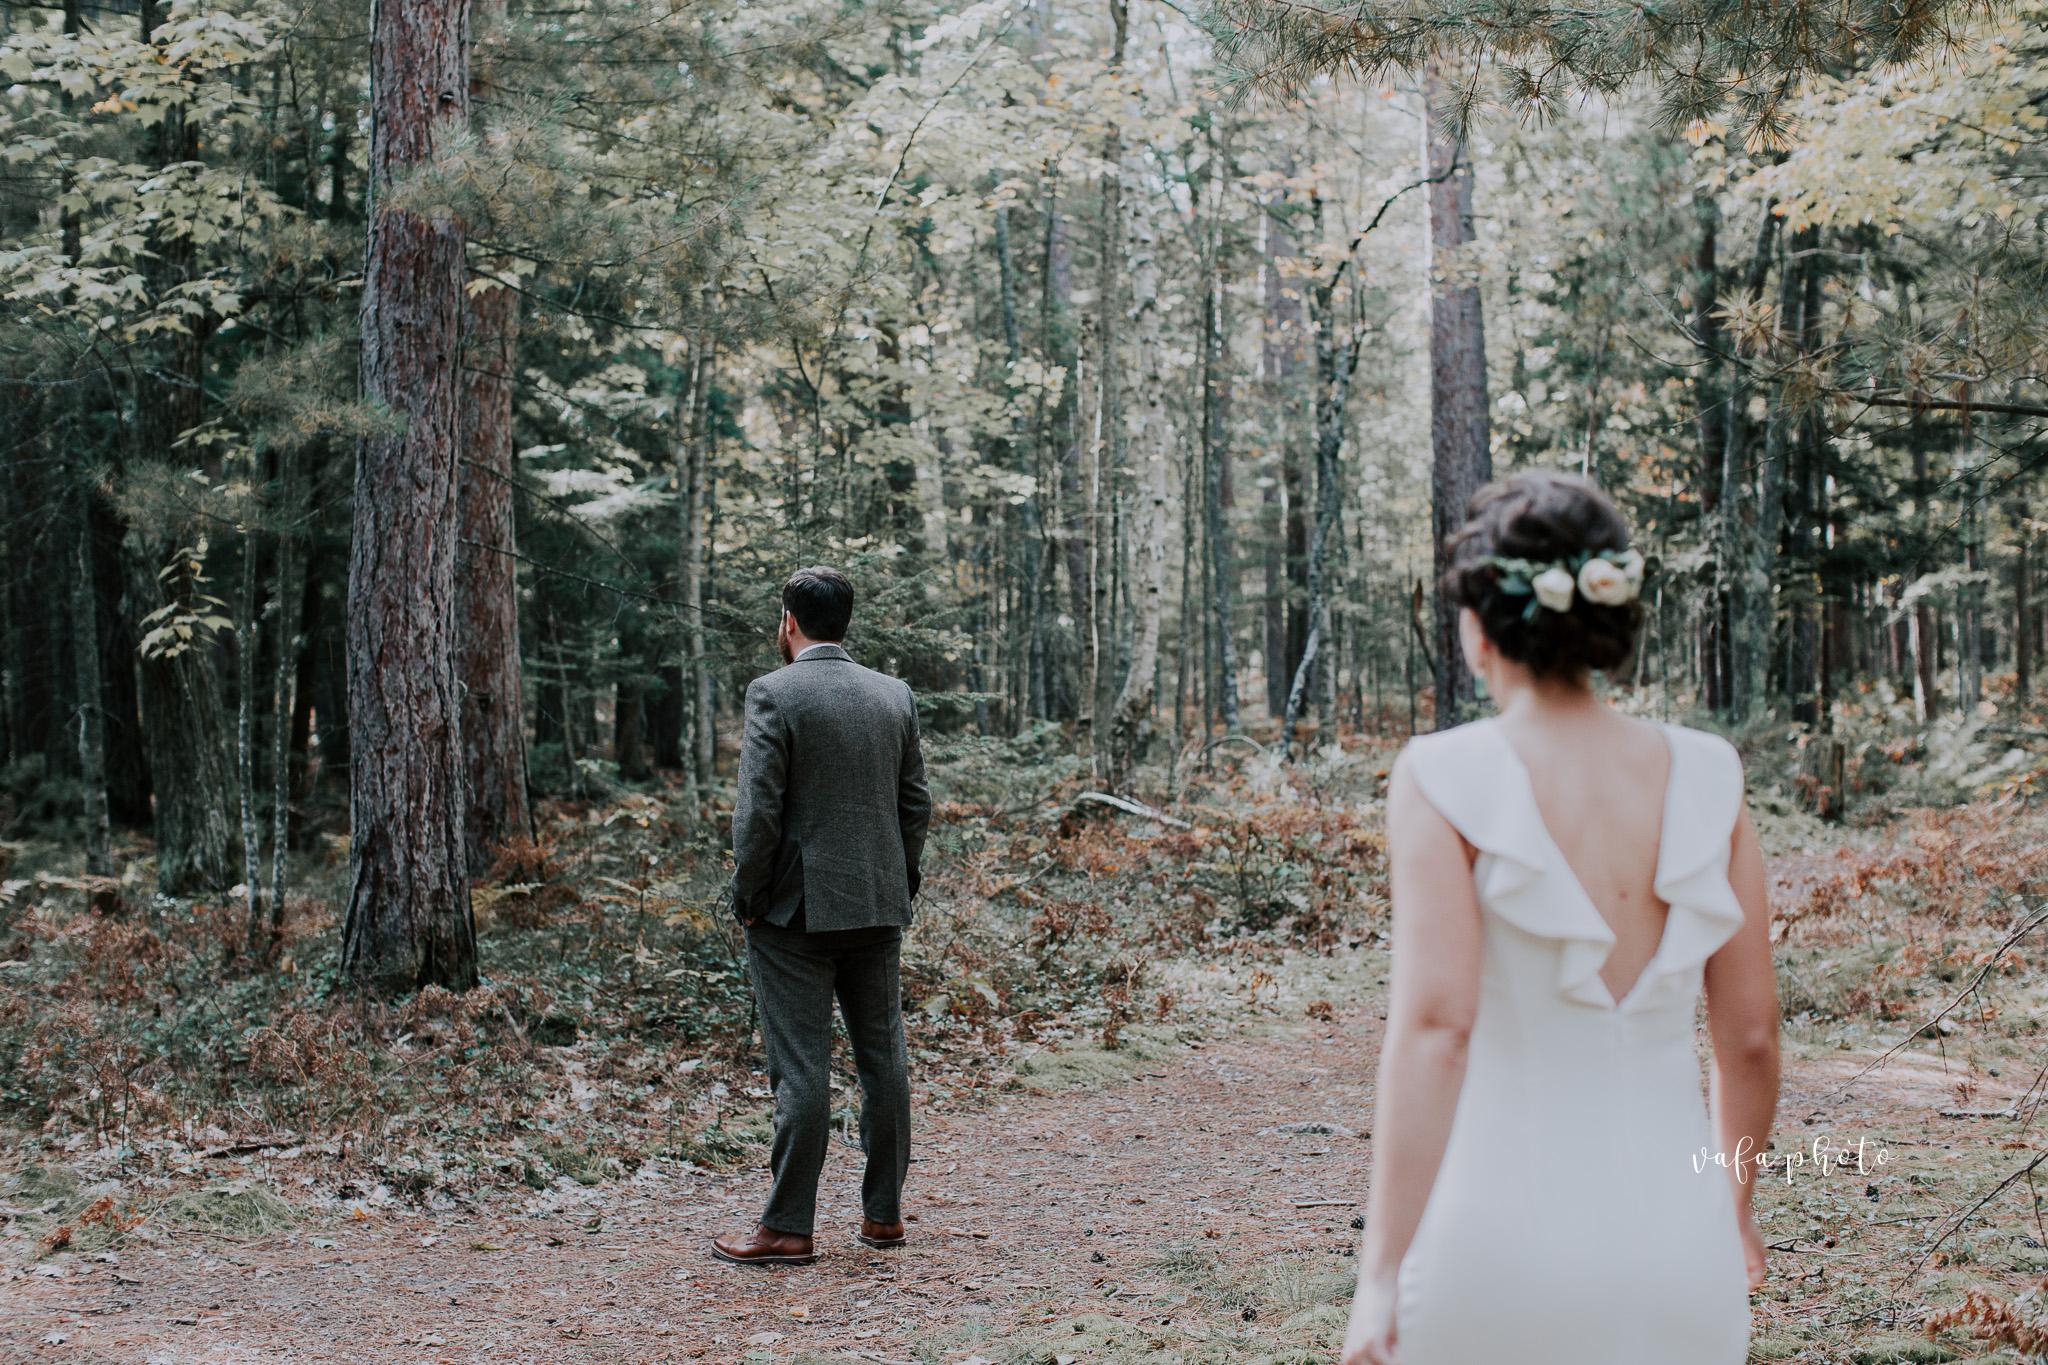 Little-Presque-Isle-Michigan-Wedding-Kim-Kyle-Vafa-Photo-10.jpg